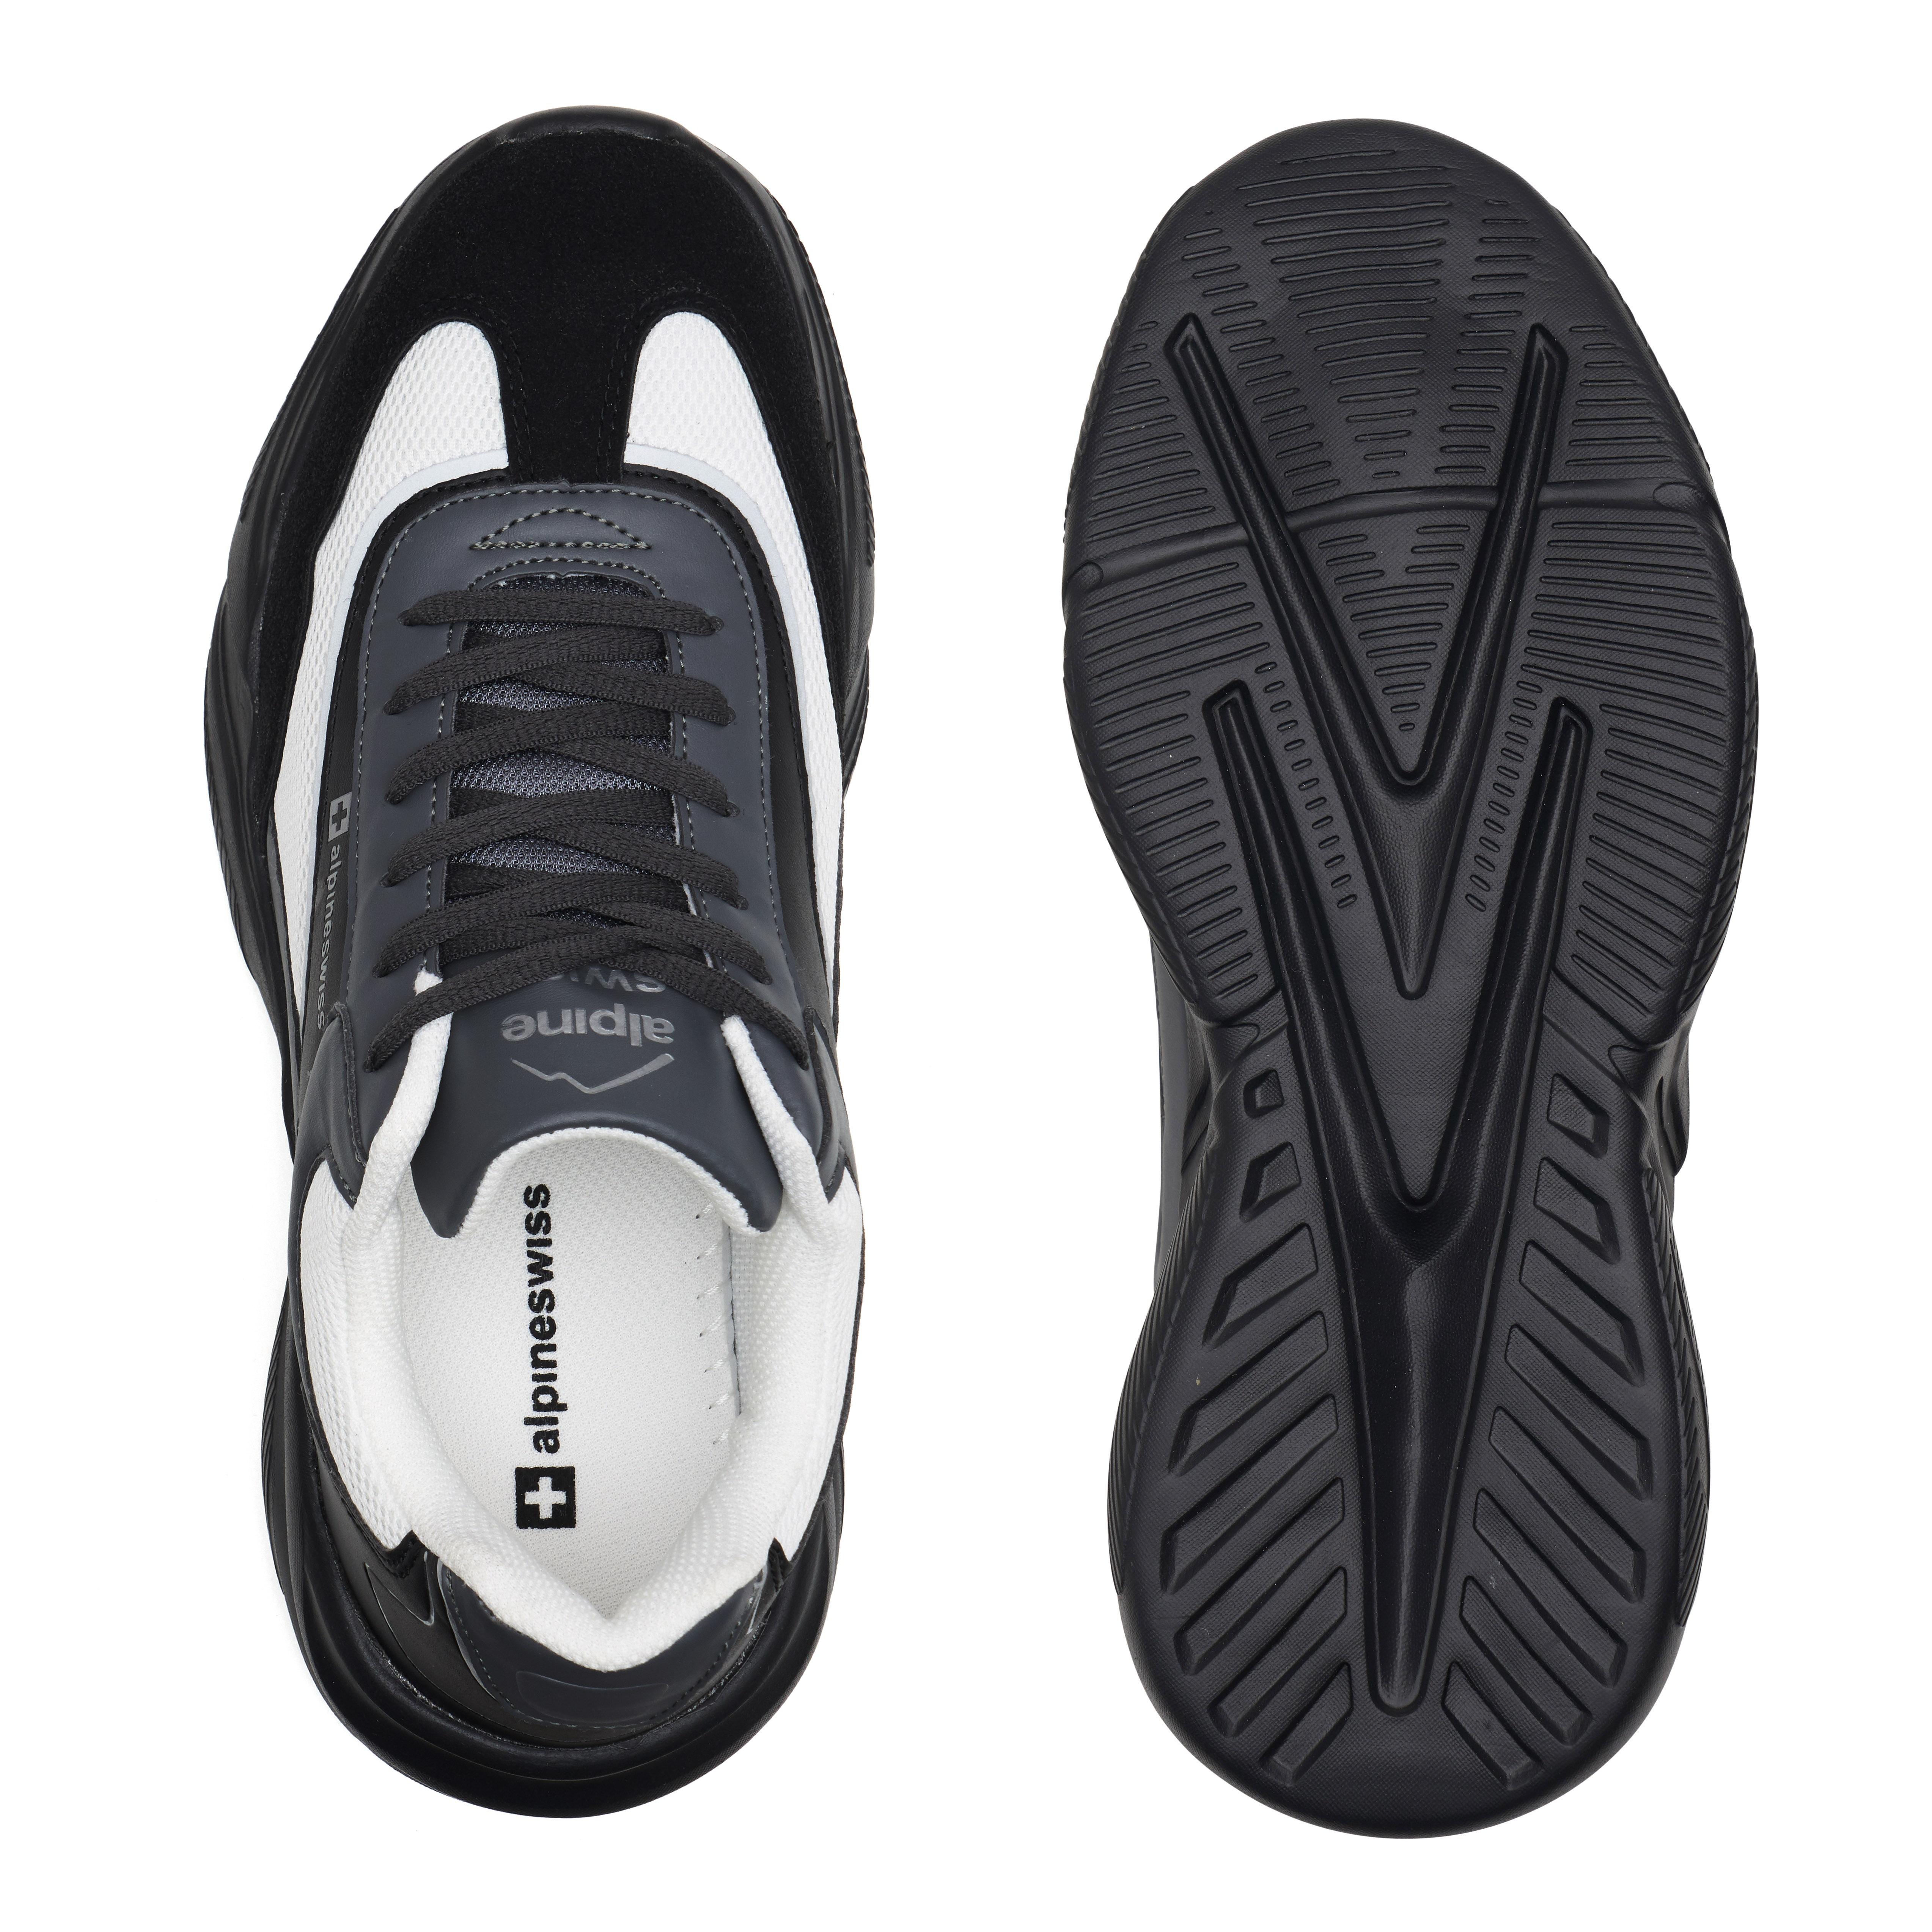 Alpine-Swiss-Stuart-Mens-Chunky-Sneakers-Retro-Platform-Dad-Tennis-Shoes thumbnail 22